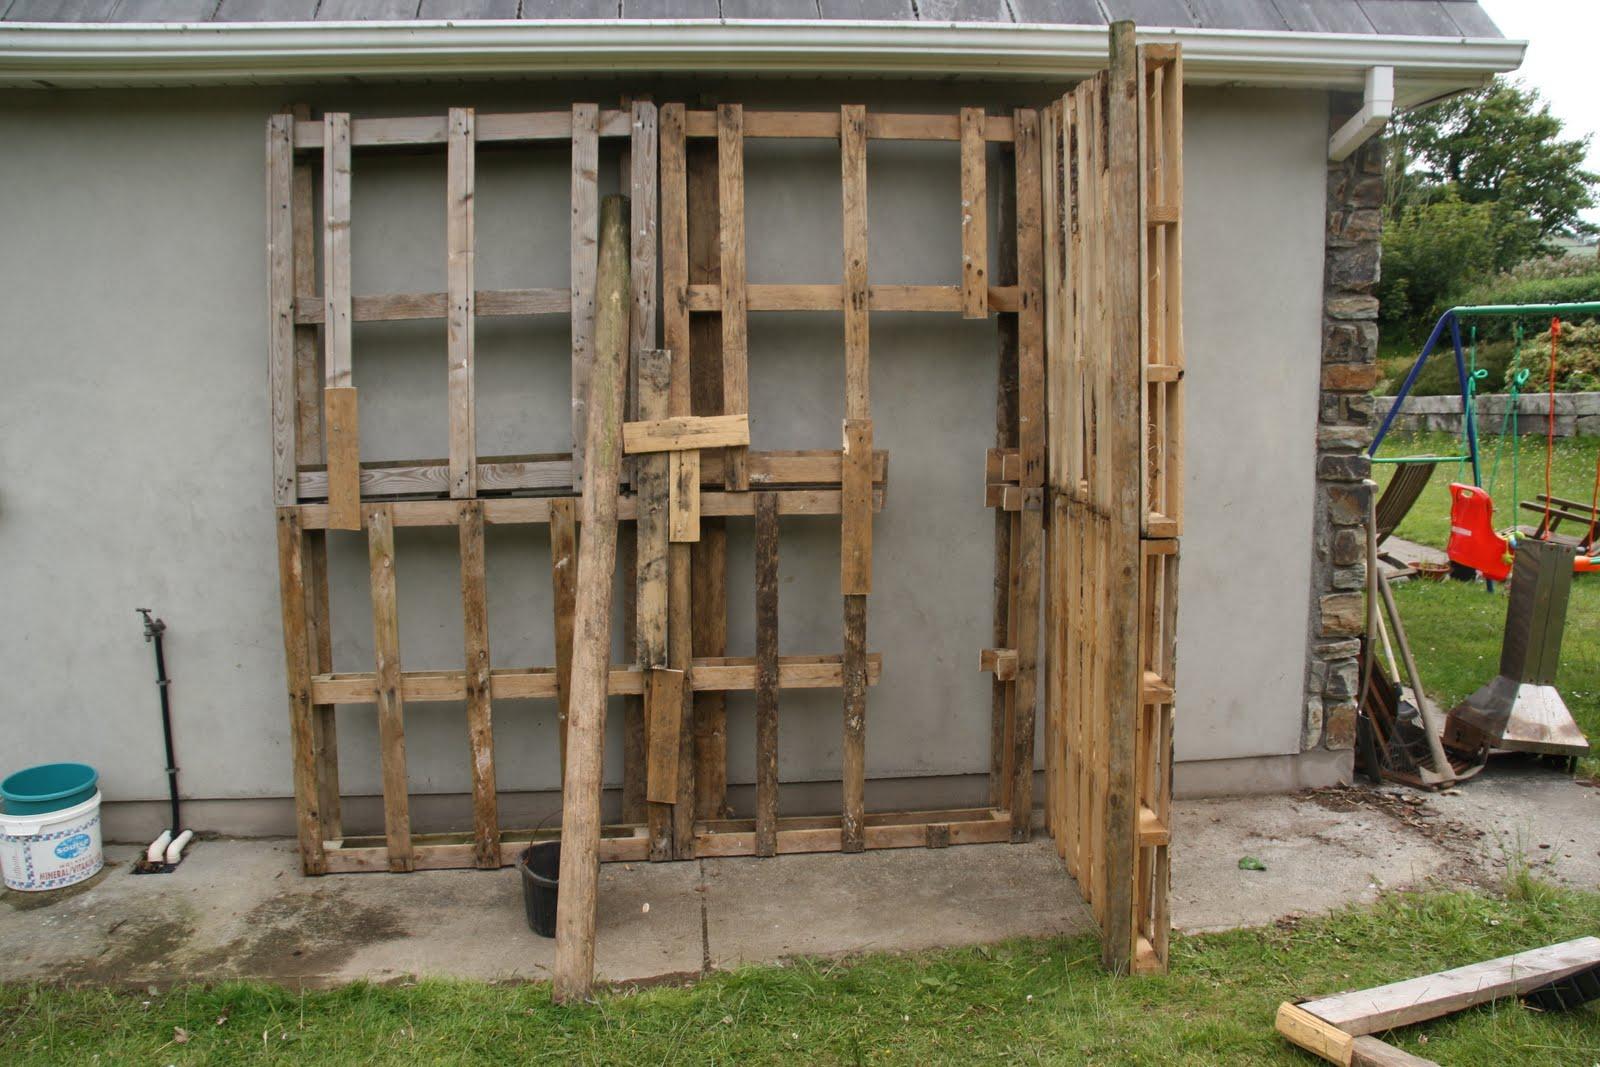 Clonlin Building A Garden Shed For Less Than 10 Euro